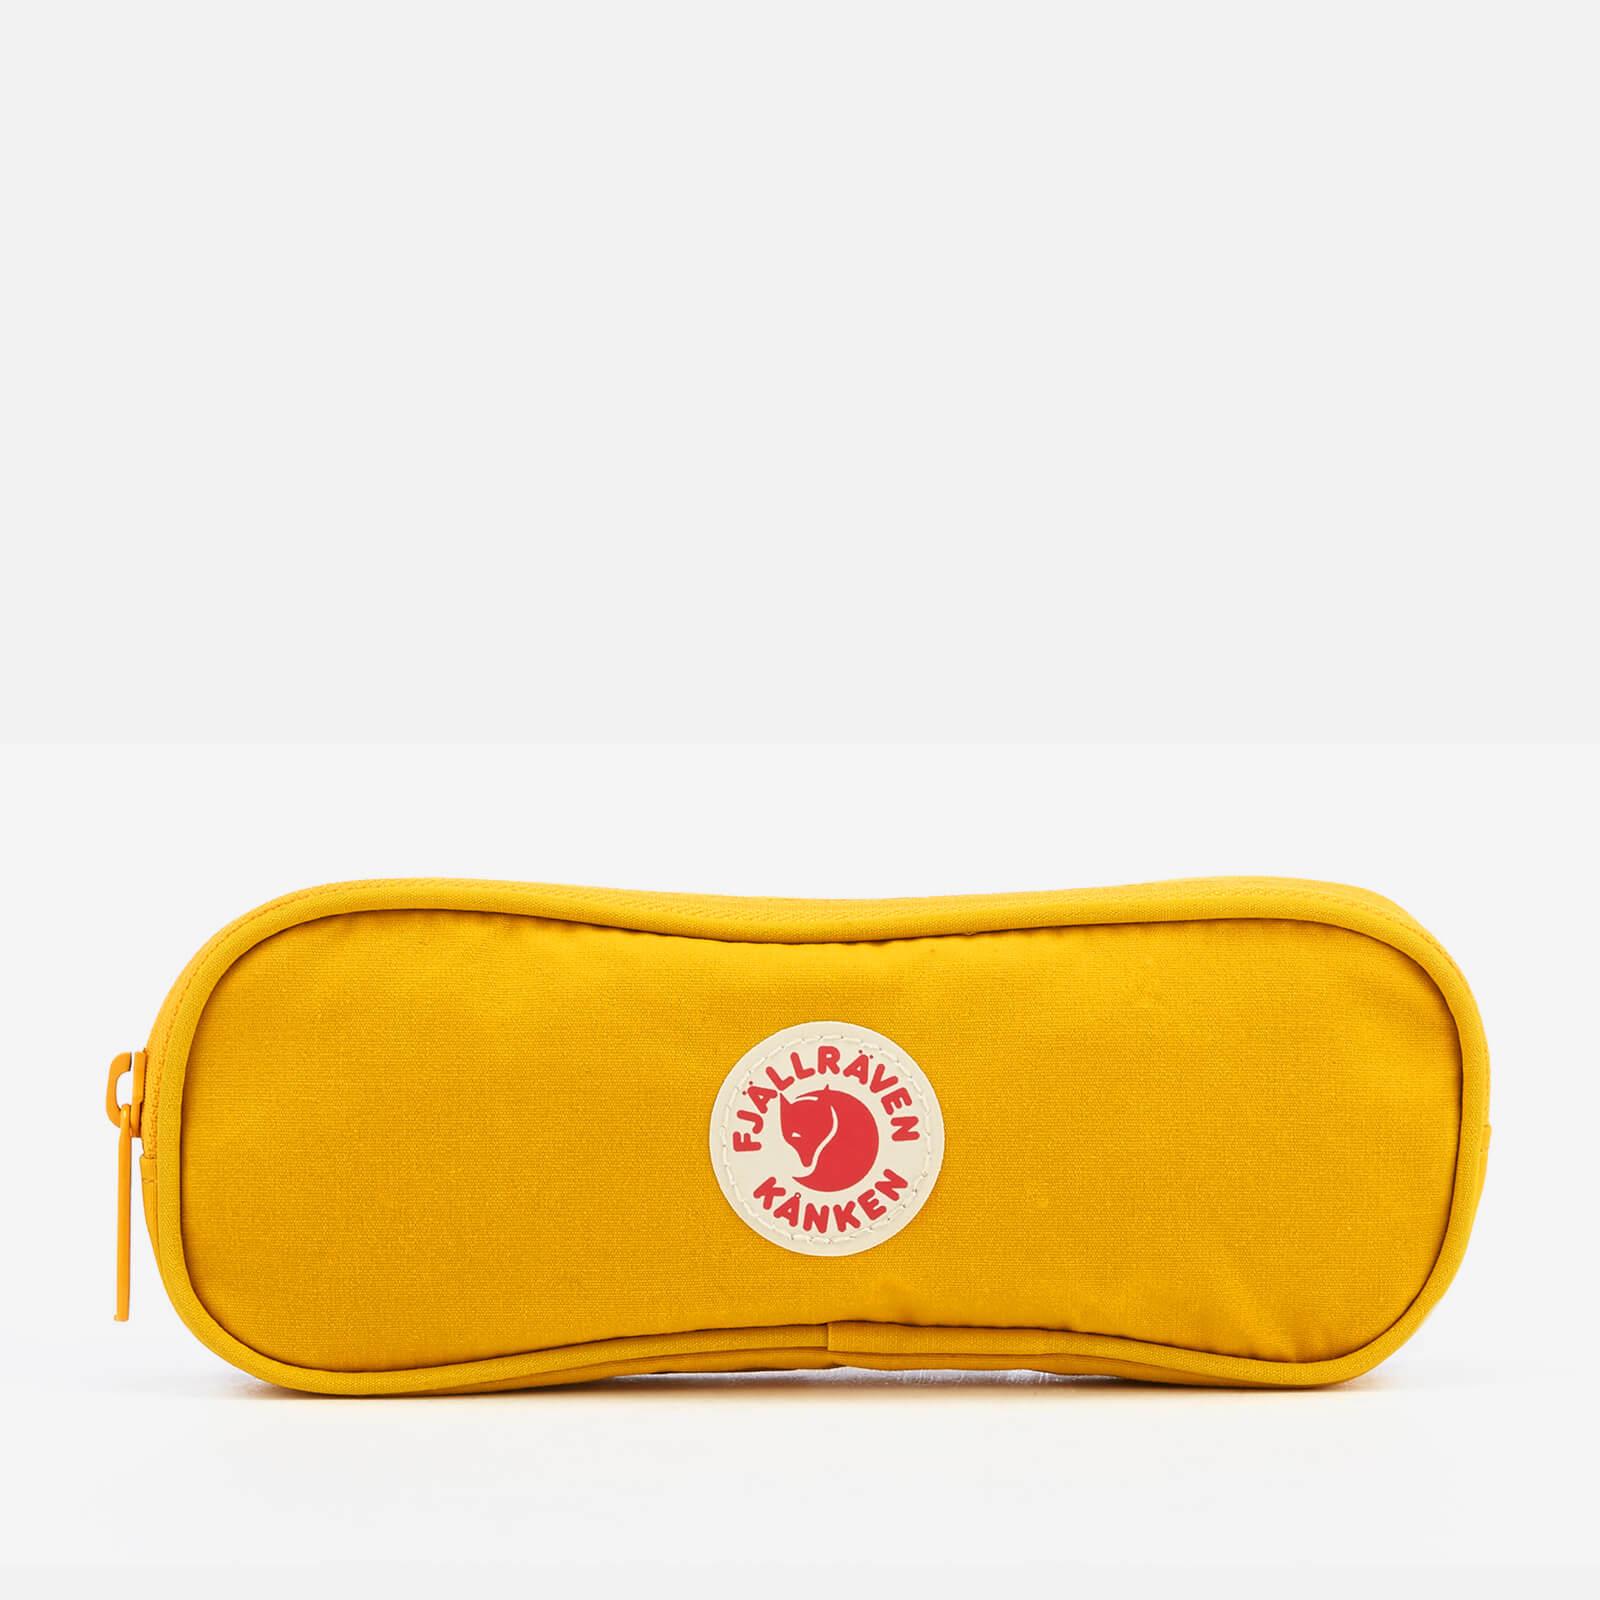 Fjallraven Kanken Pen Case - Warm Yellow